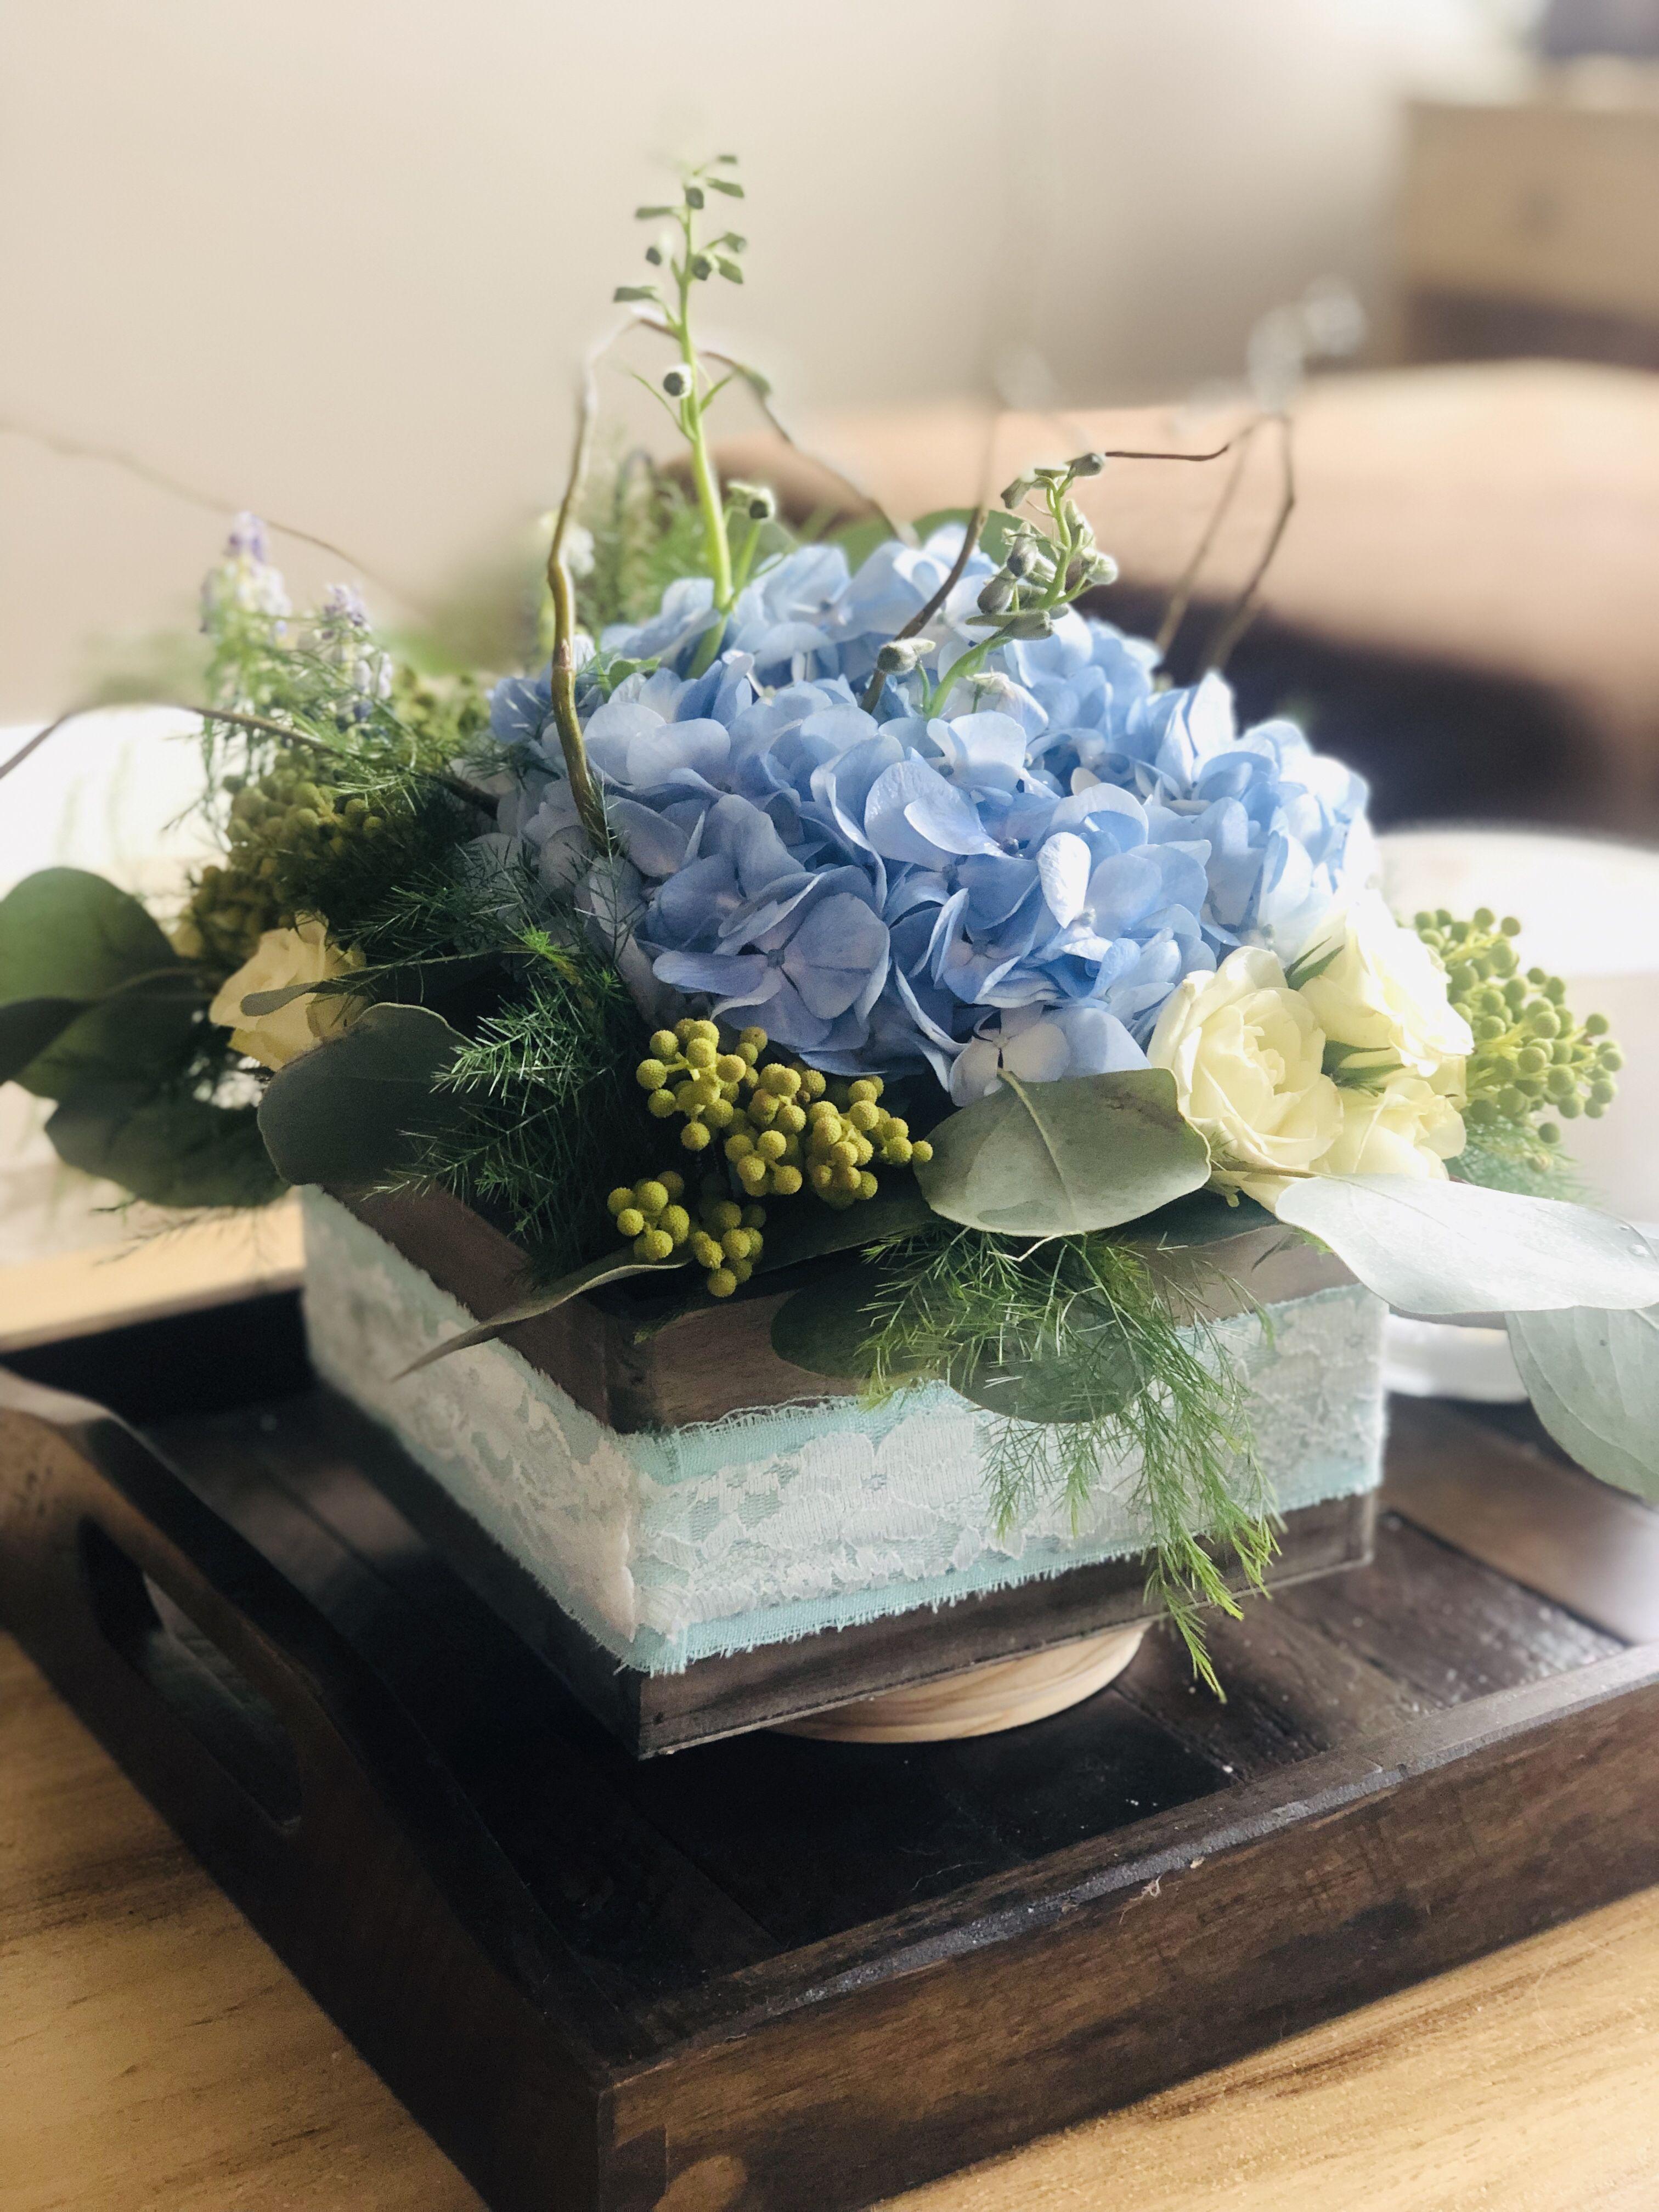 Blue Hydrangea, Blue Muscari, White Spray Roses, Brunia